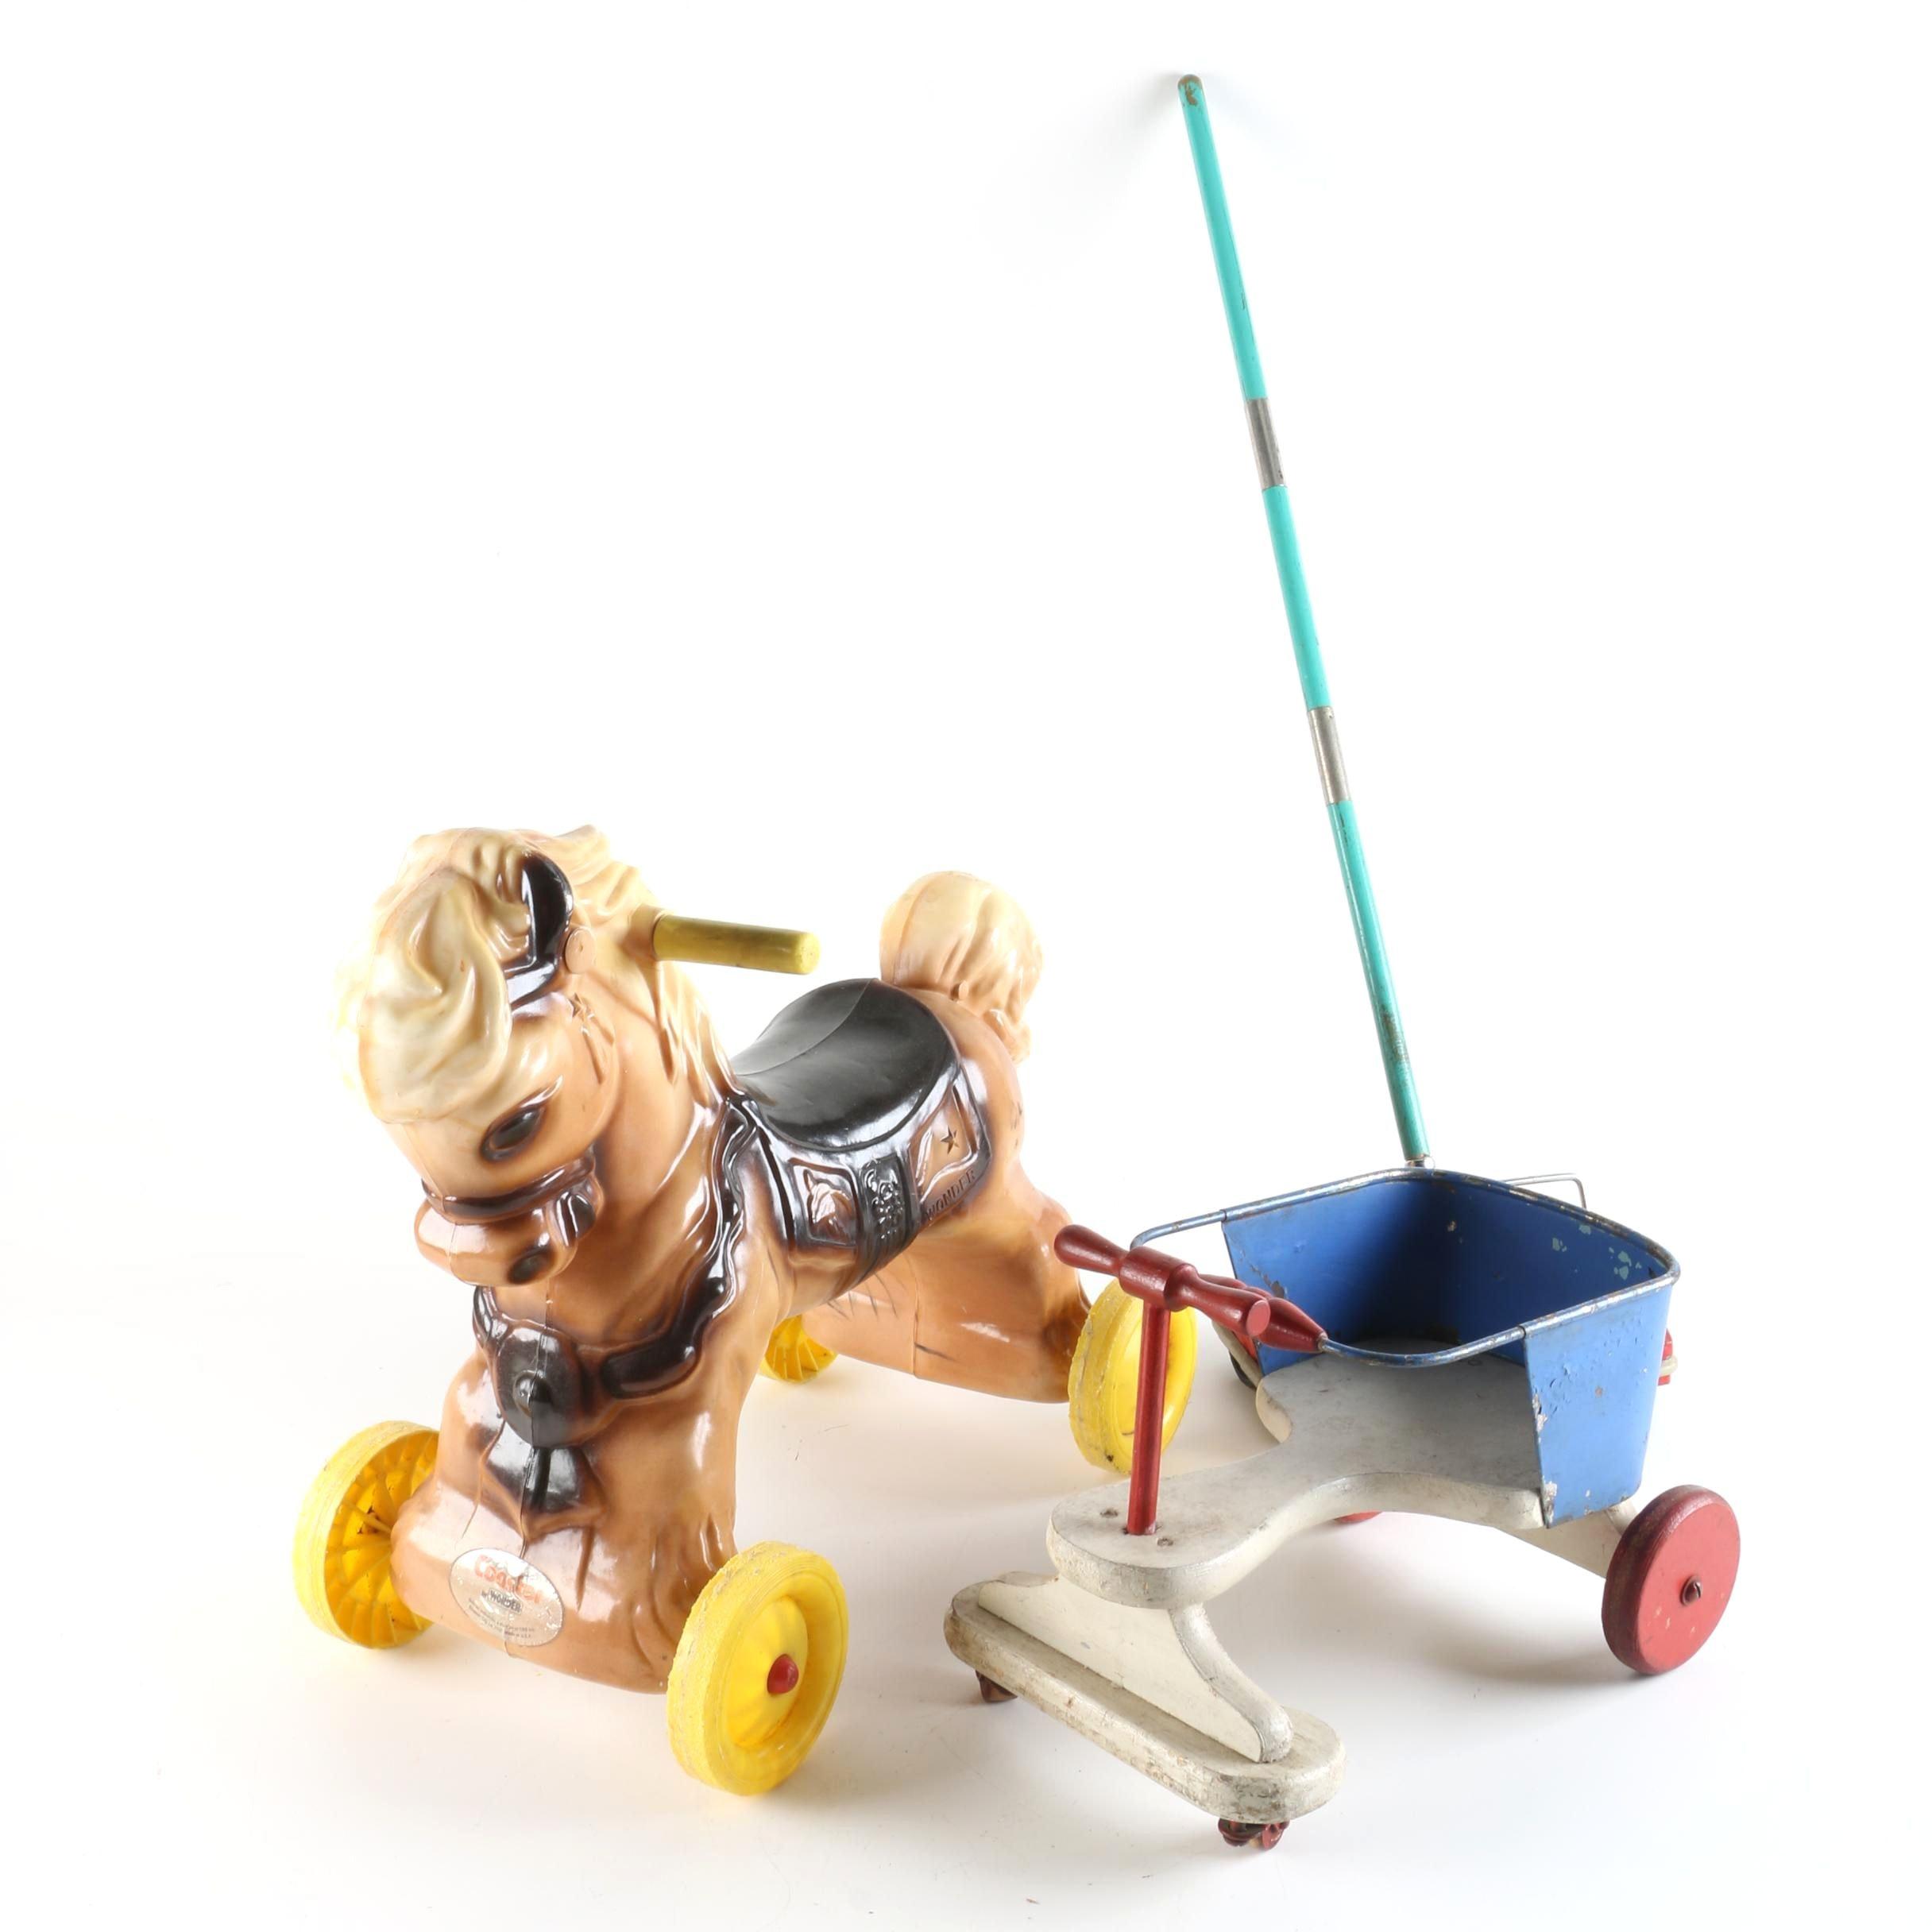 Vintage Children's Toys Including Wonder Ride-On Toy Horse